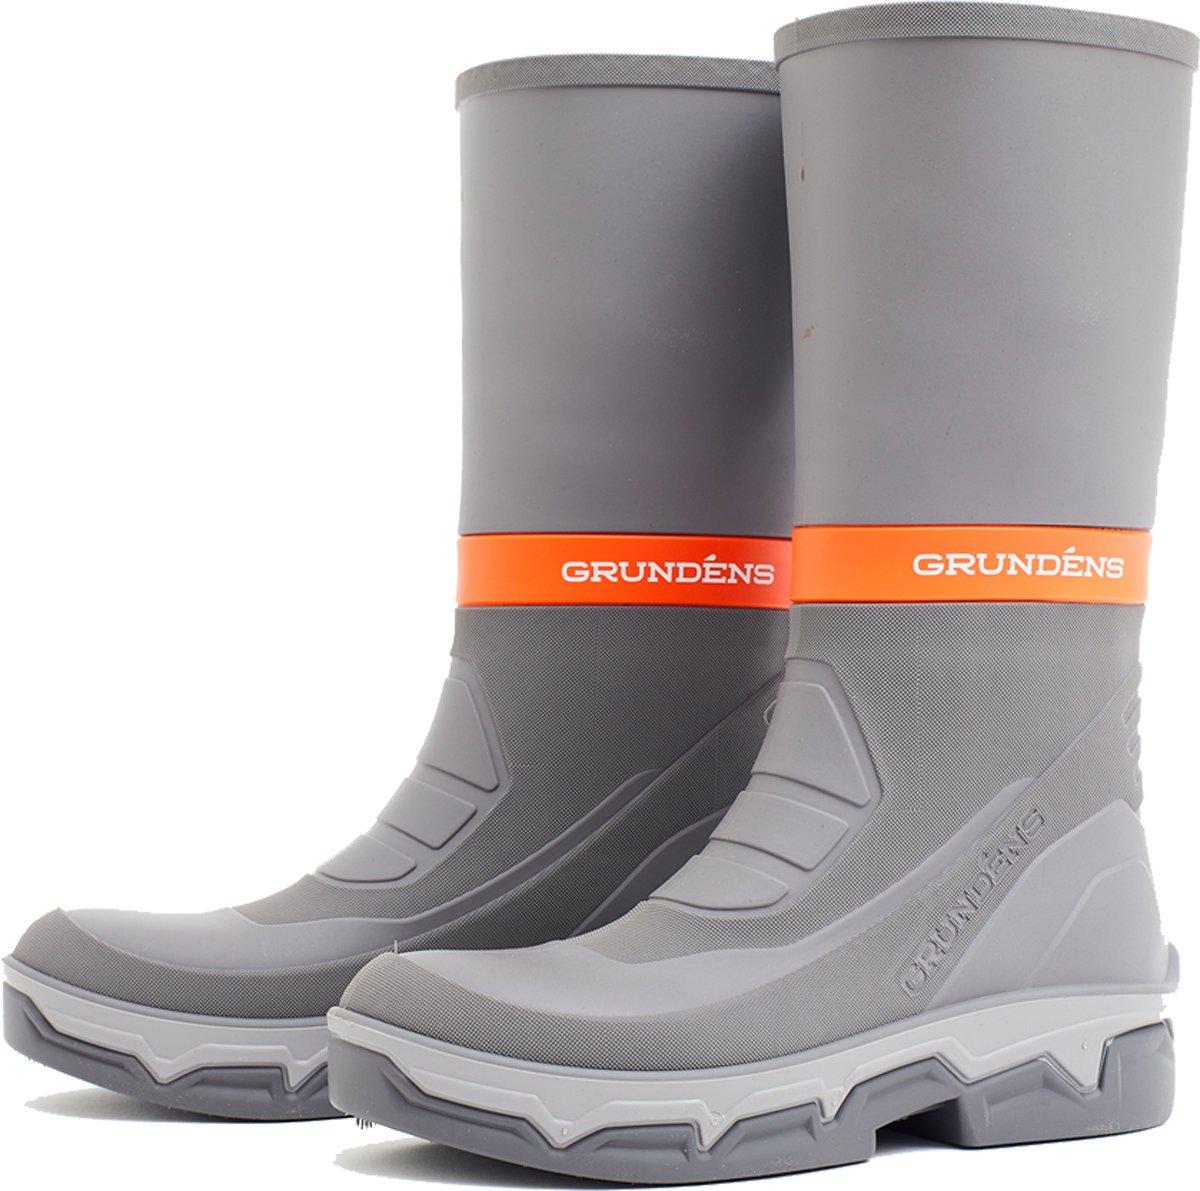 Grundéns Deck-Boss Fishing Boots, Grey - 11 M US by Grundéns